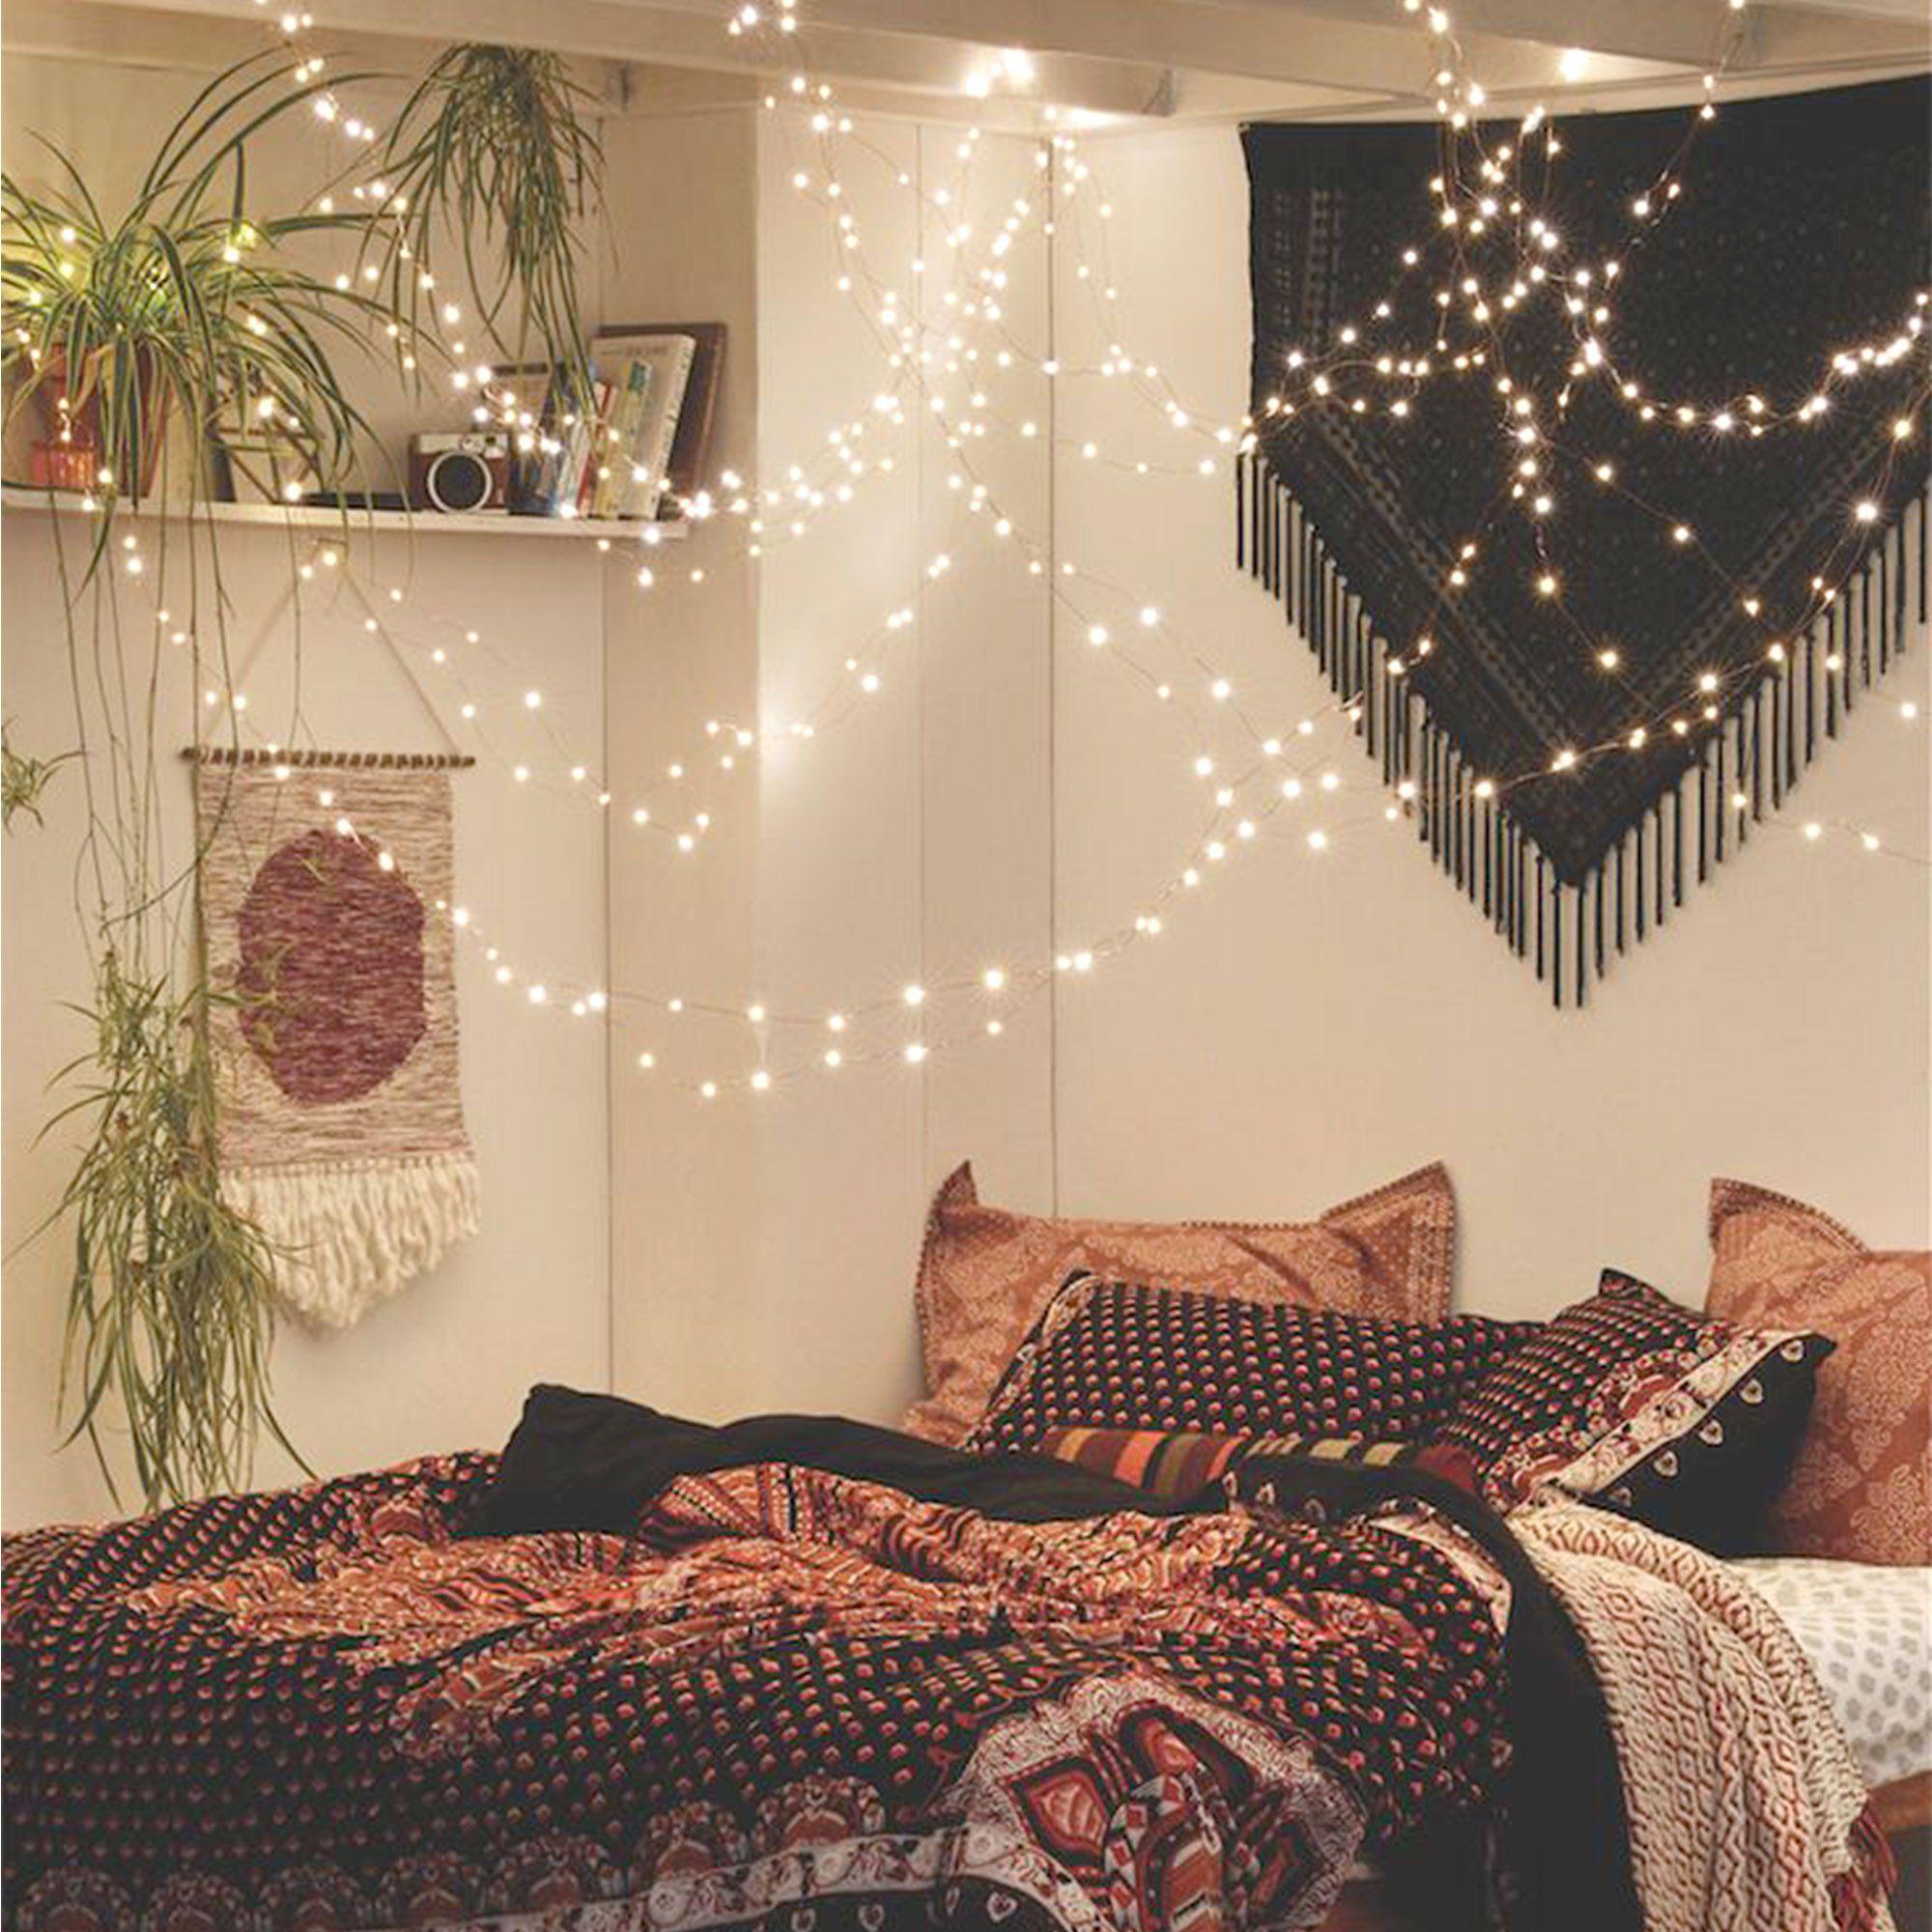 Fairystring go big in room pinterest bedroom room and